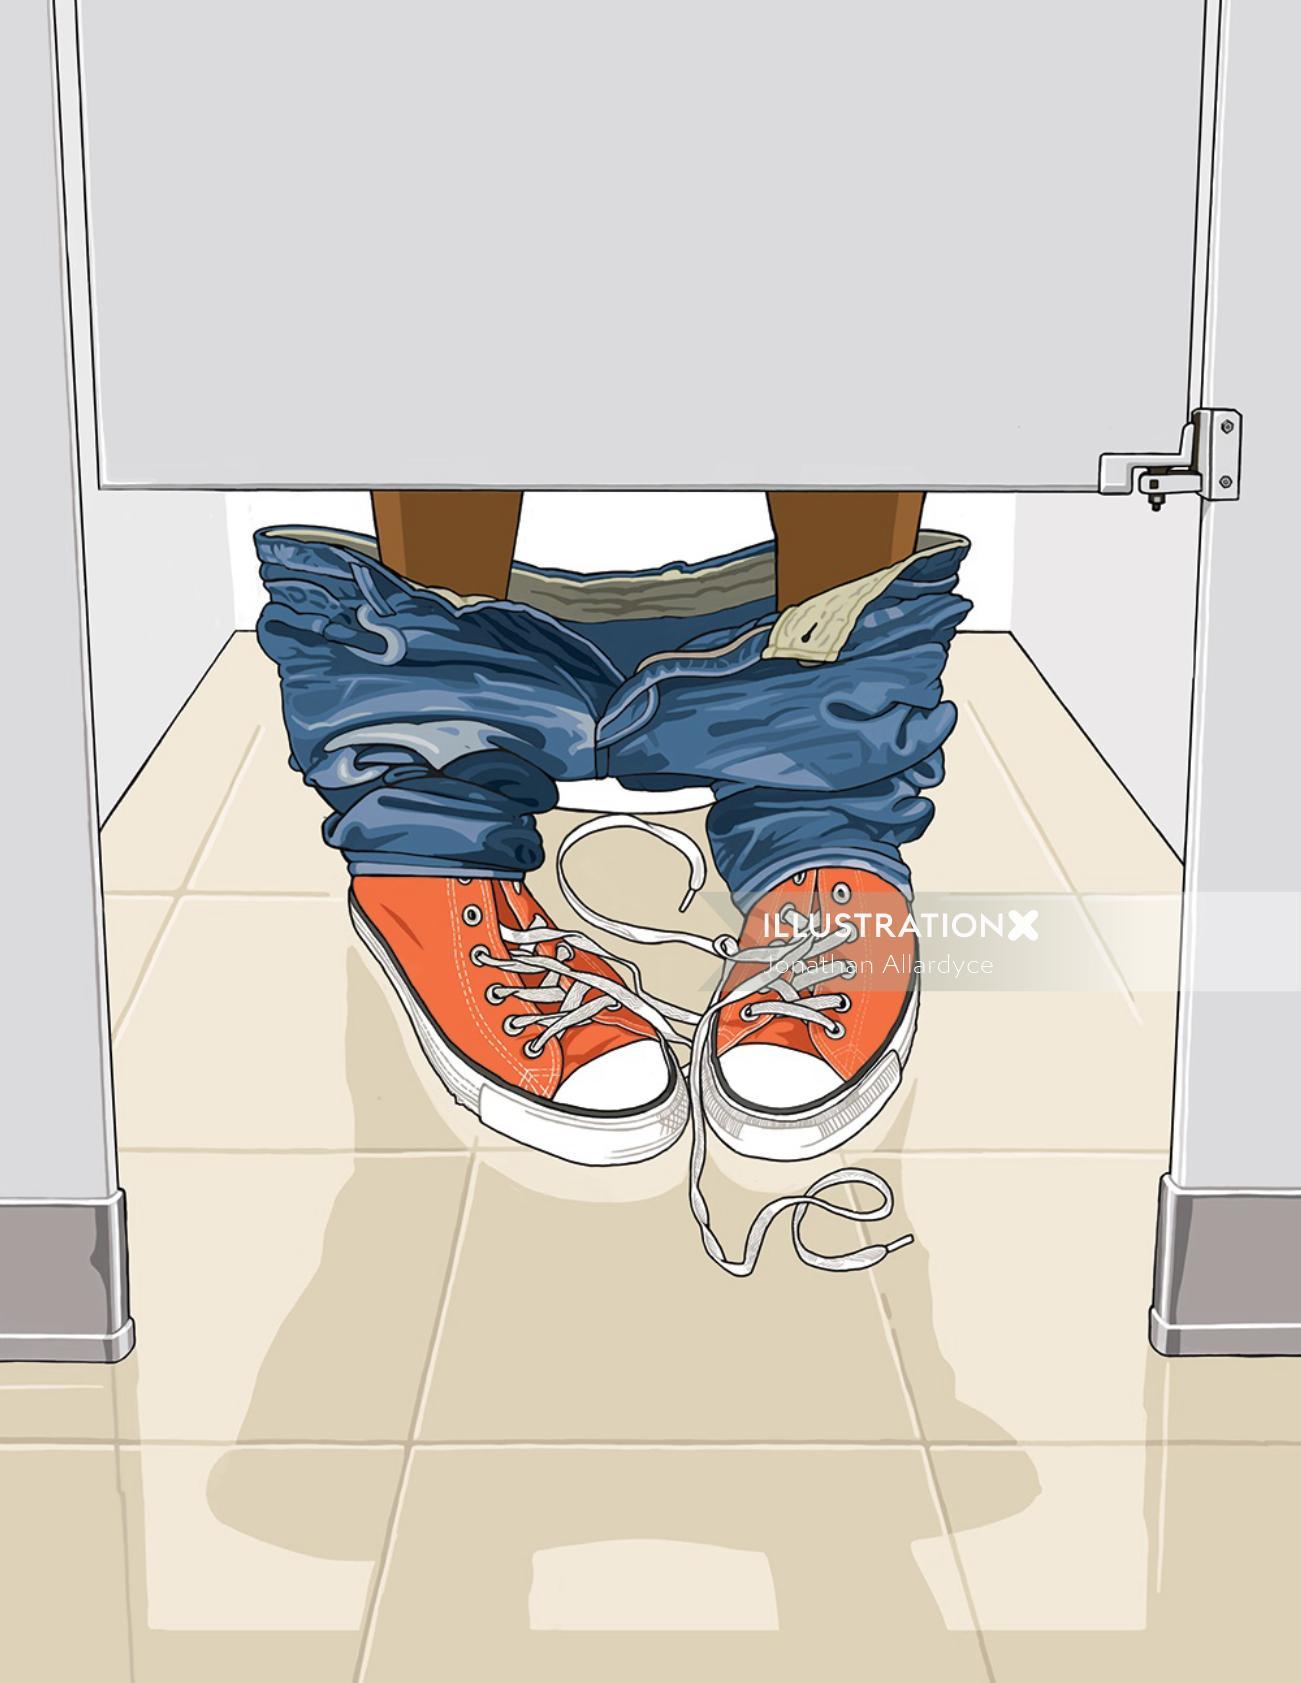 contemporary illustration of public bathroom